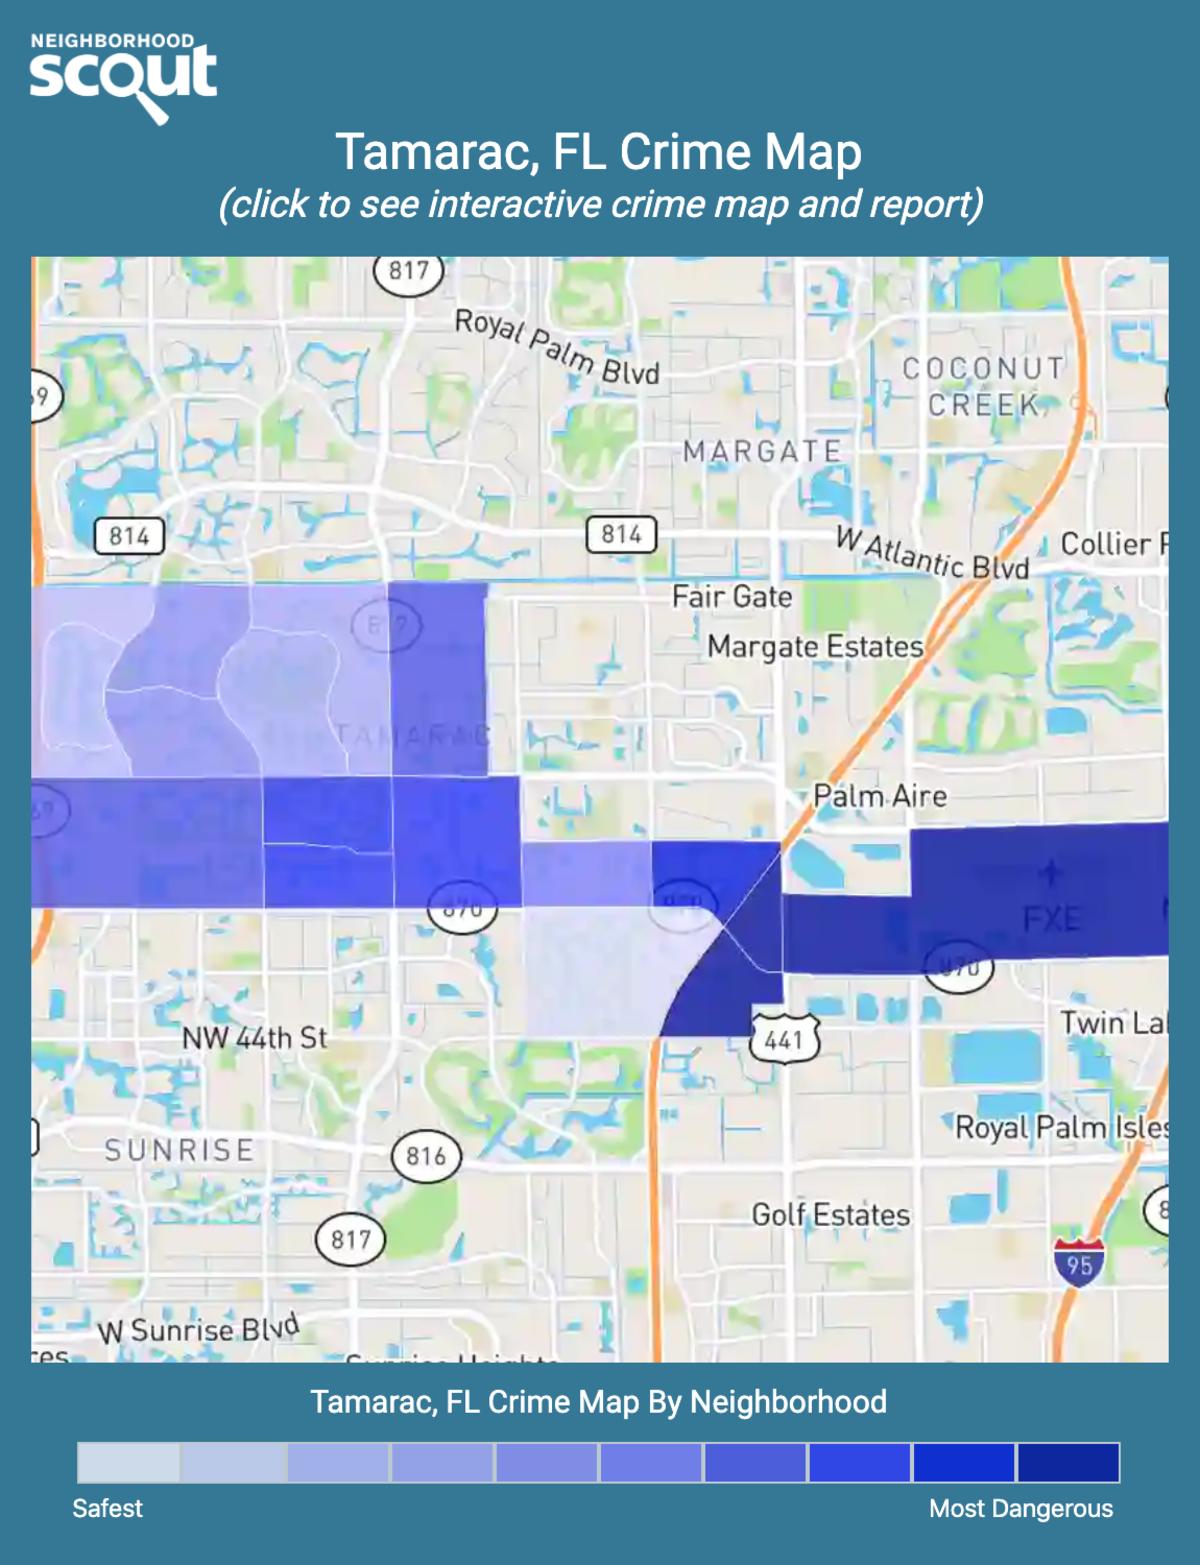 Tamarac, Florida crime map